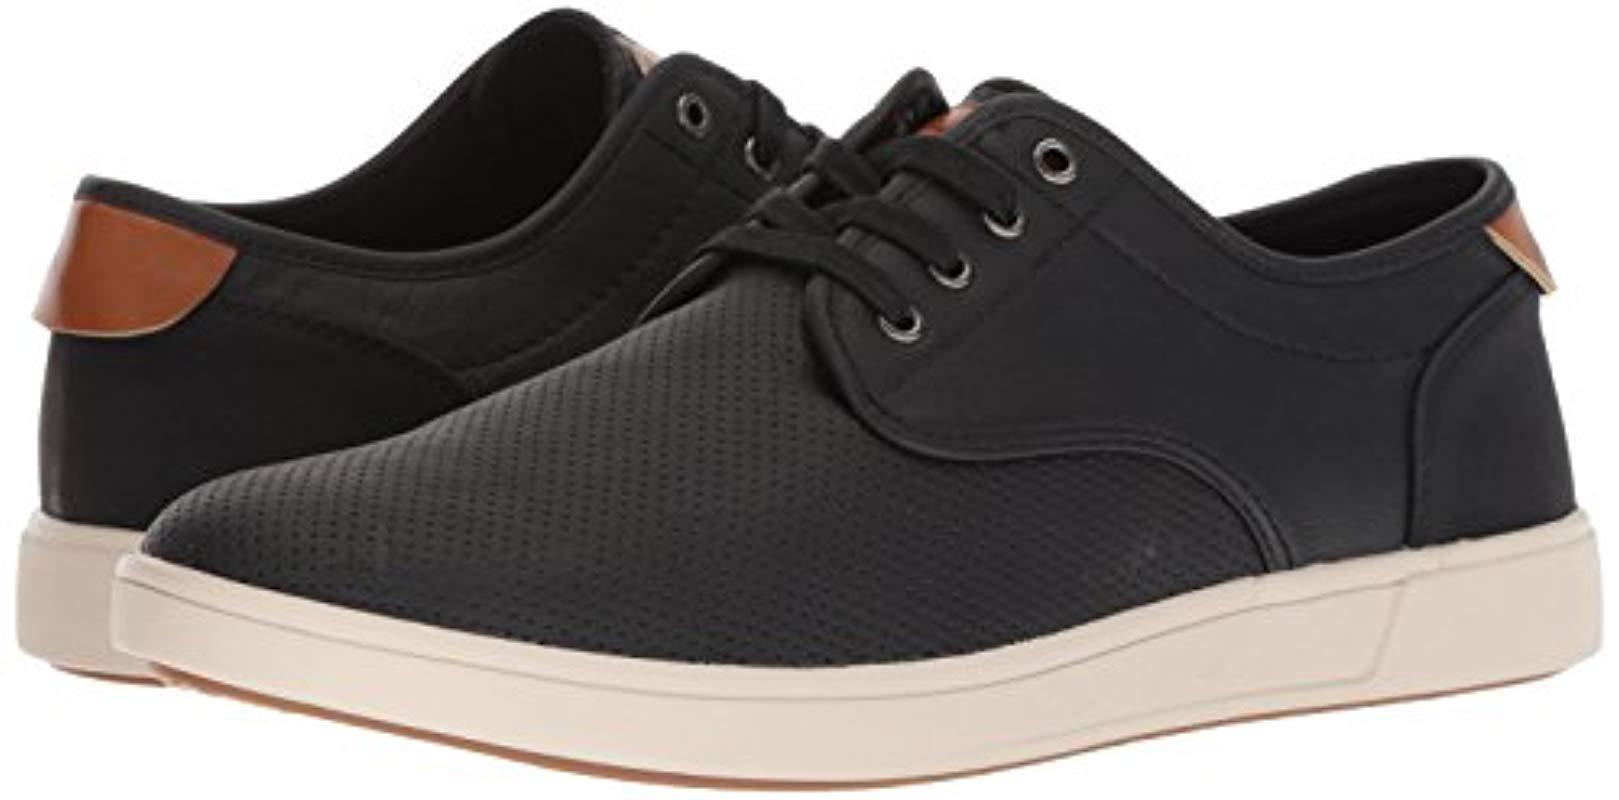 Steve Madden Flyerz Sneaker in Black